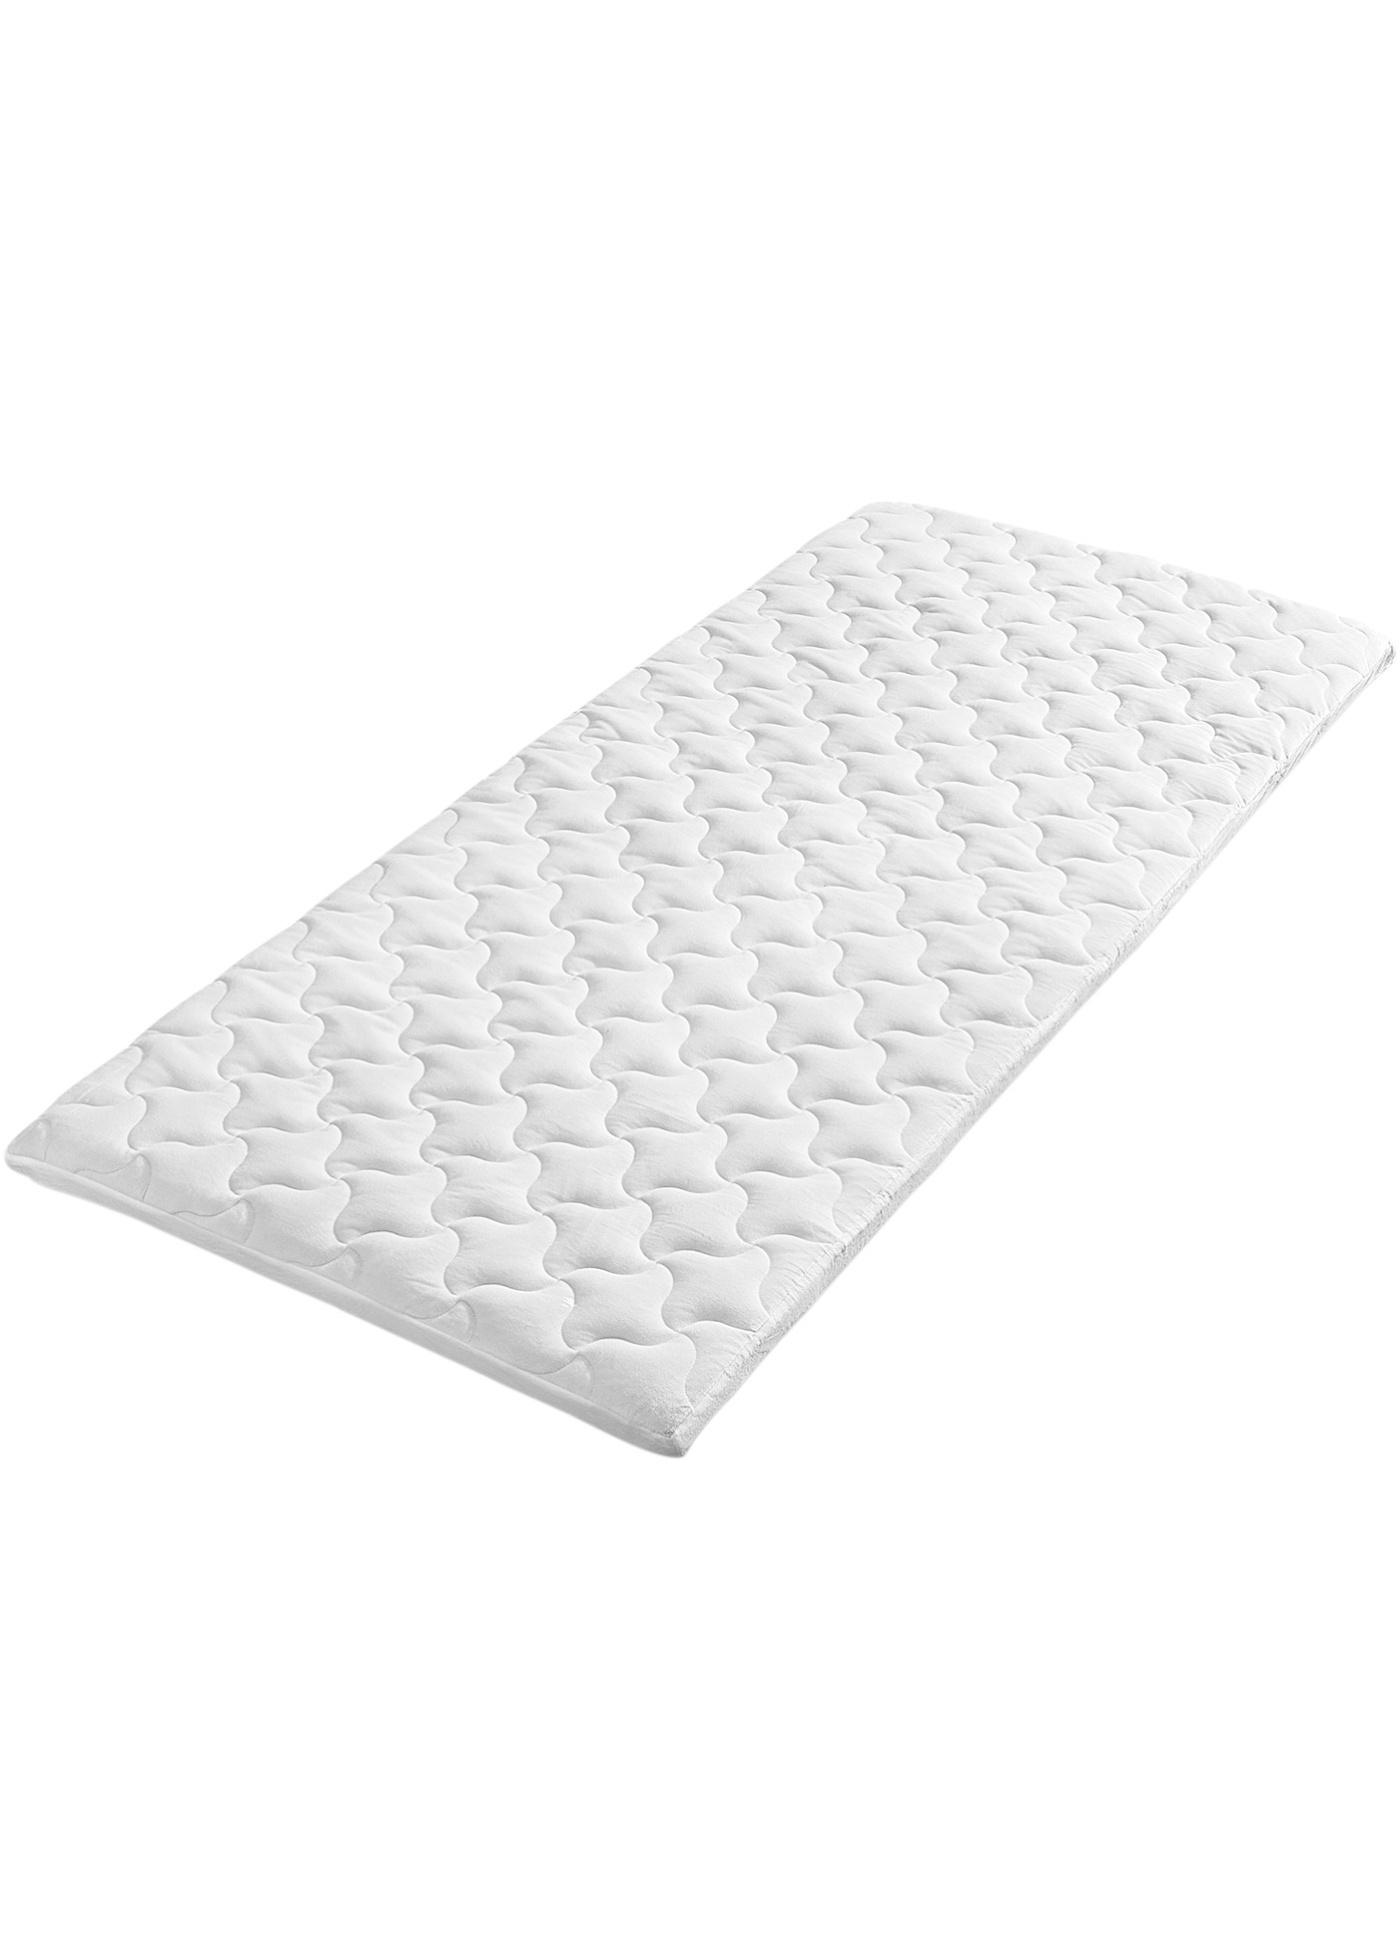 Matratzentopper 5-Zonen Komfort Plus